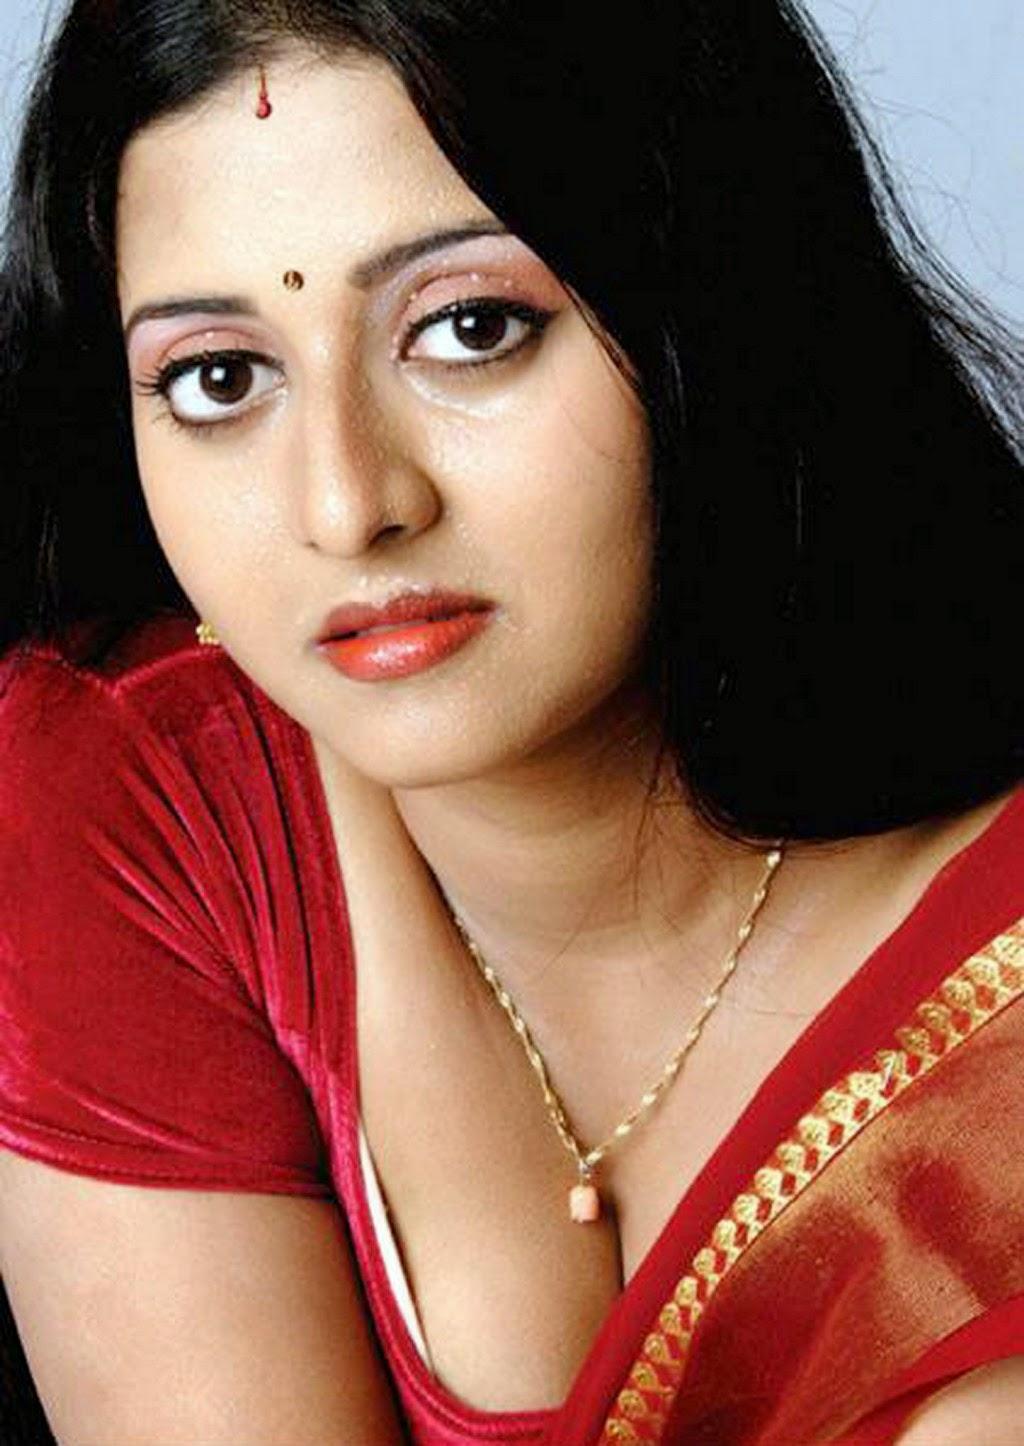 Actress Bhanupriya Aunty Boobs Photos Without Jacket Boobs -6333